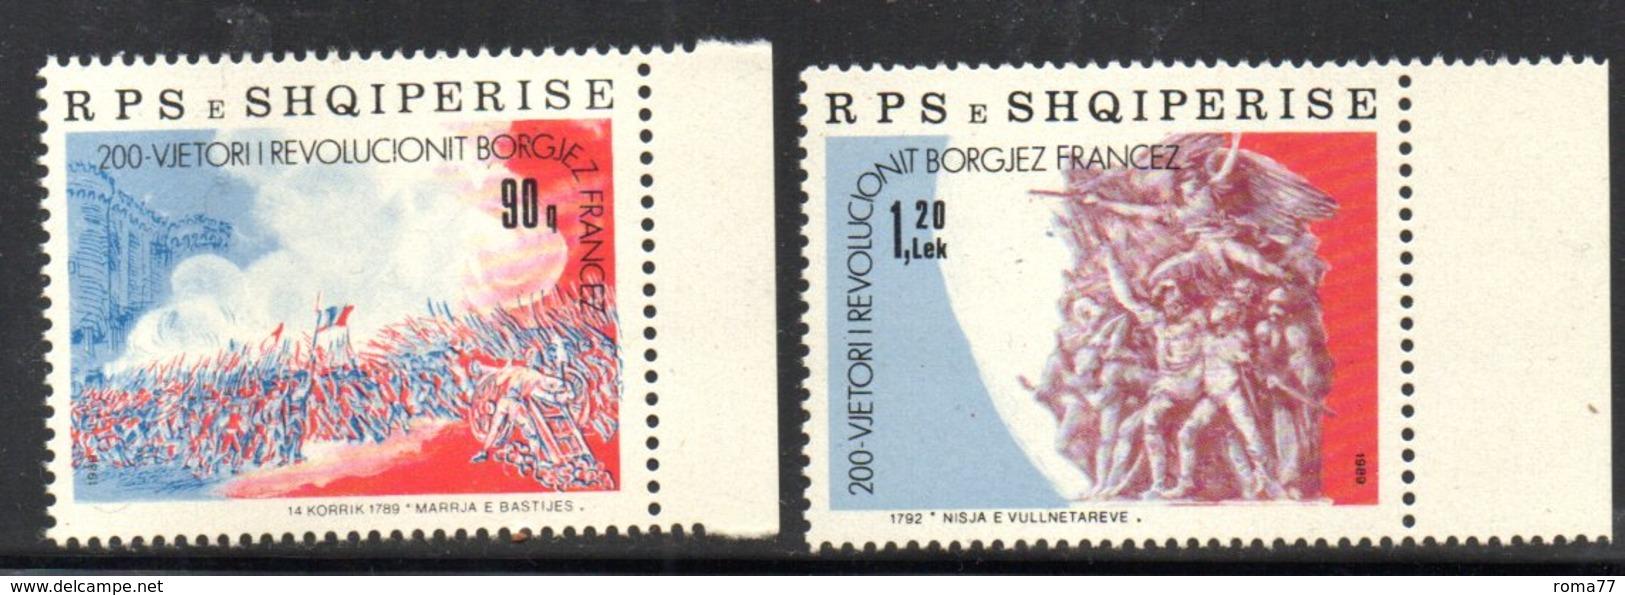 XP4036 - ALBANIA 1989 , Yvert Serie N. 2195/2196  ***  Rivoluzione Francese - Albania